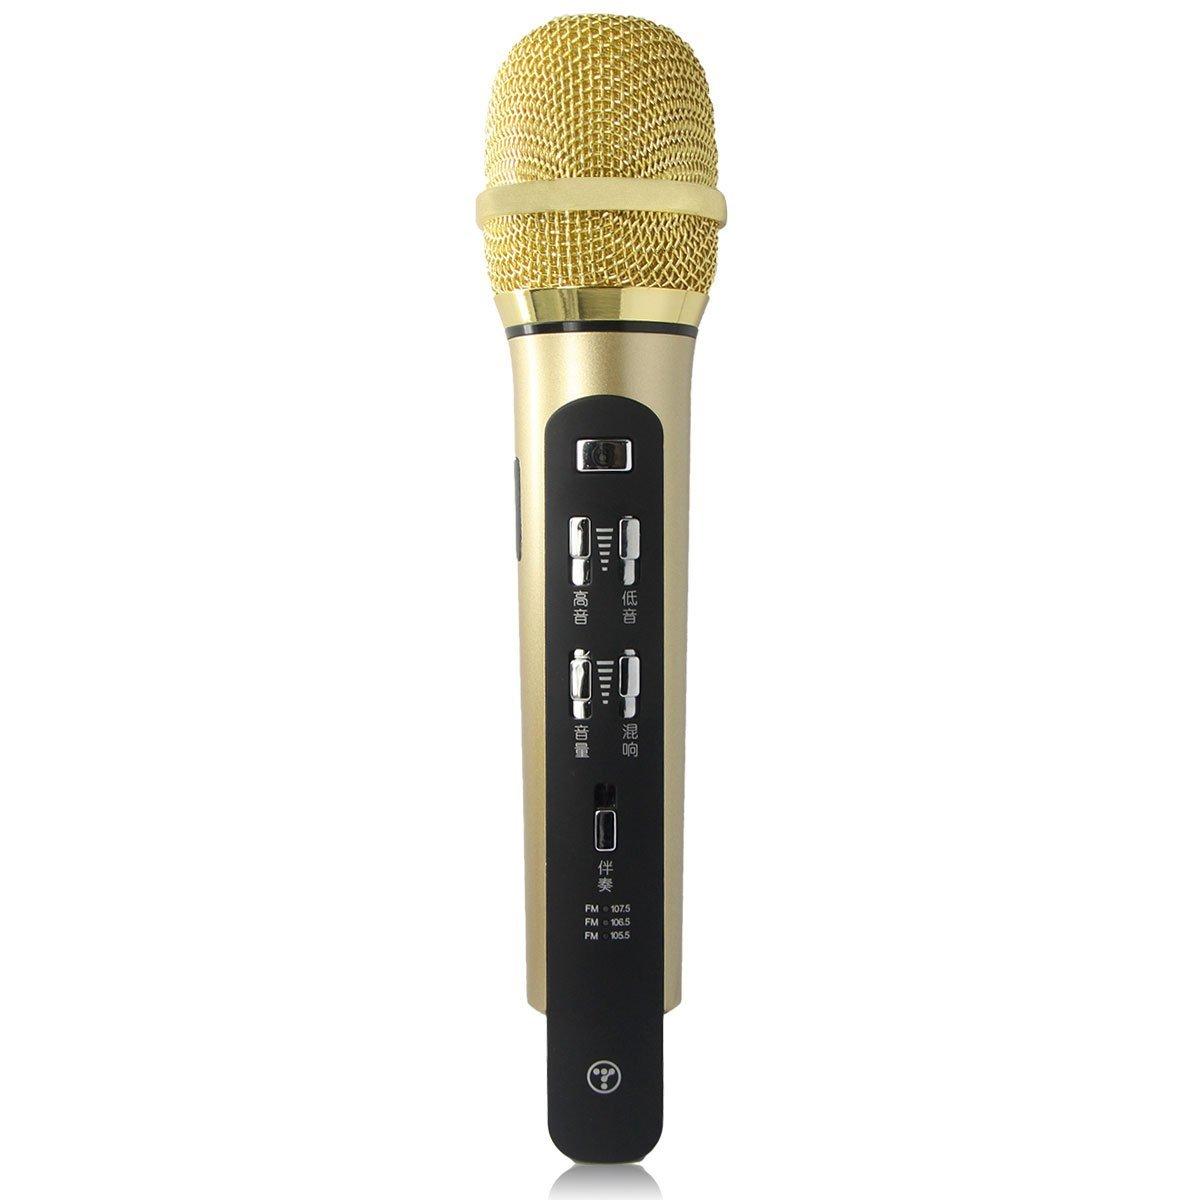 Tuxun K9 Microphone